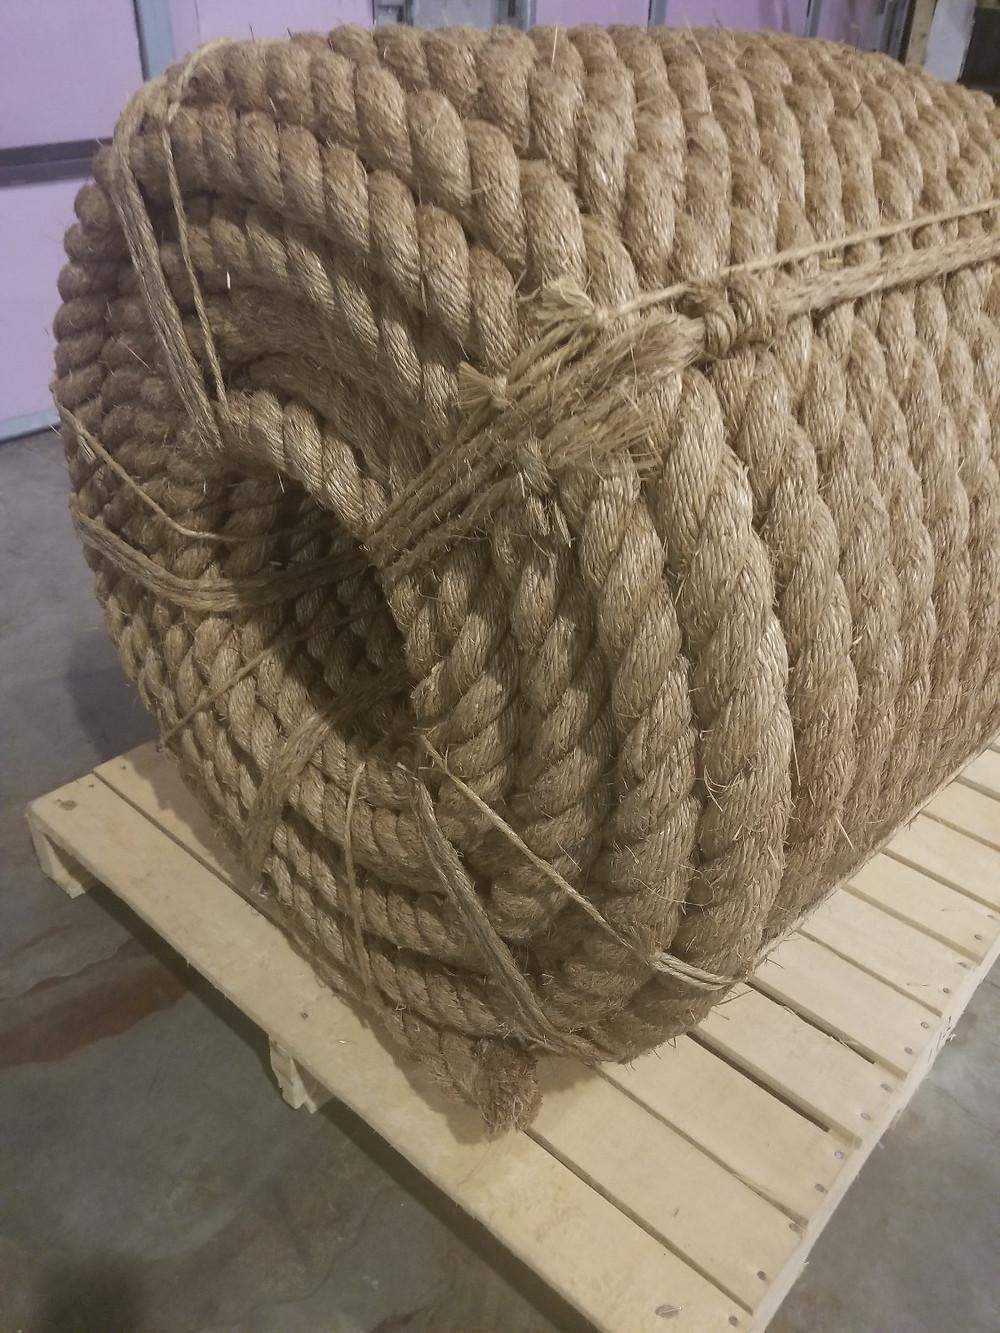 Large spool of natural manila decorative rope